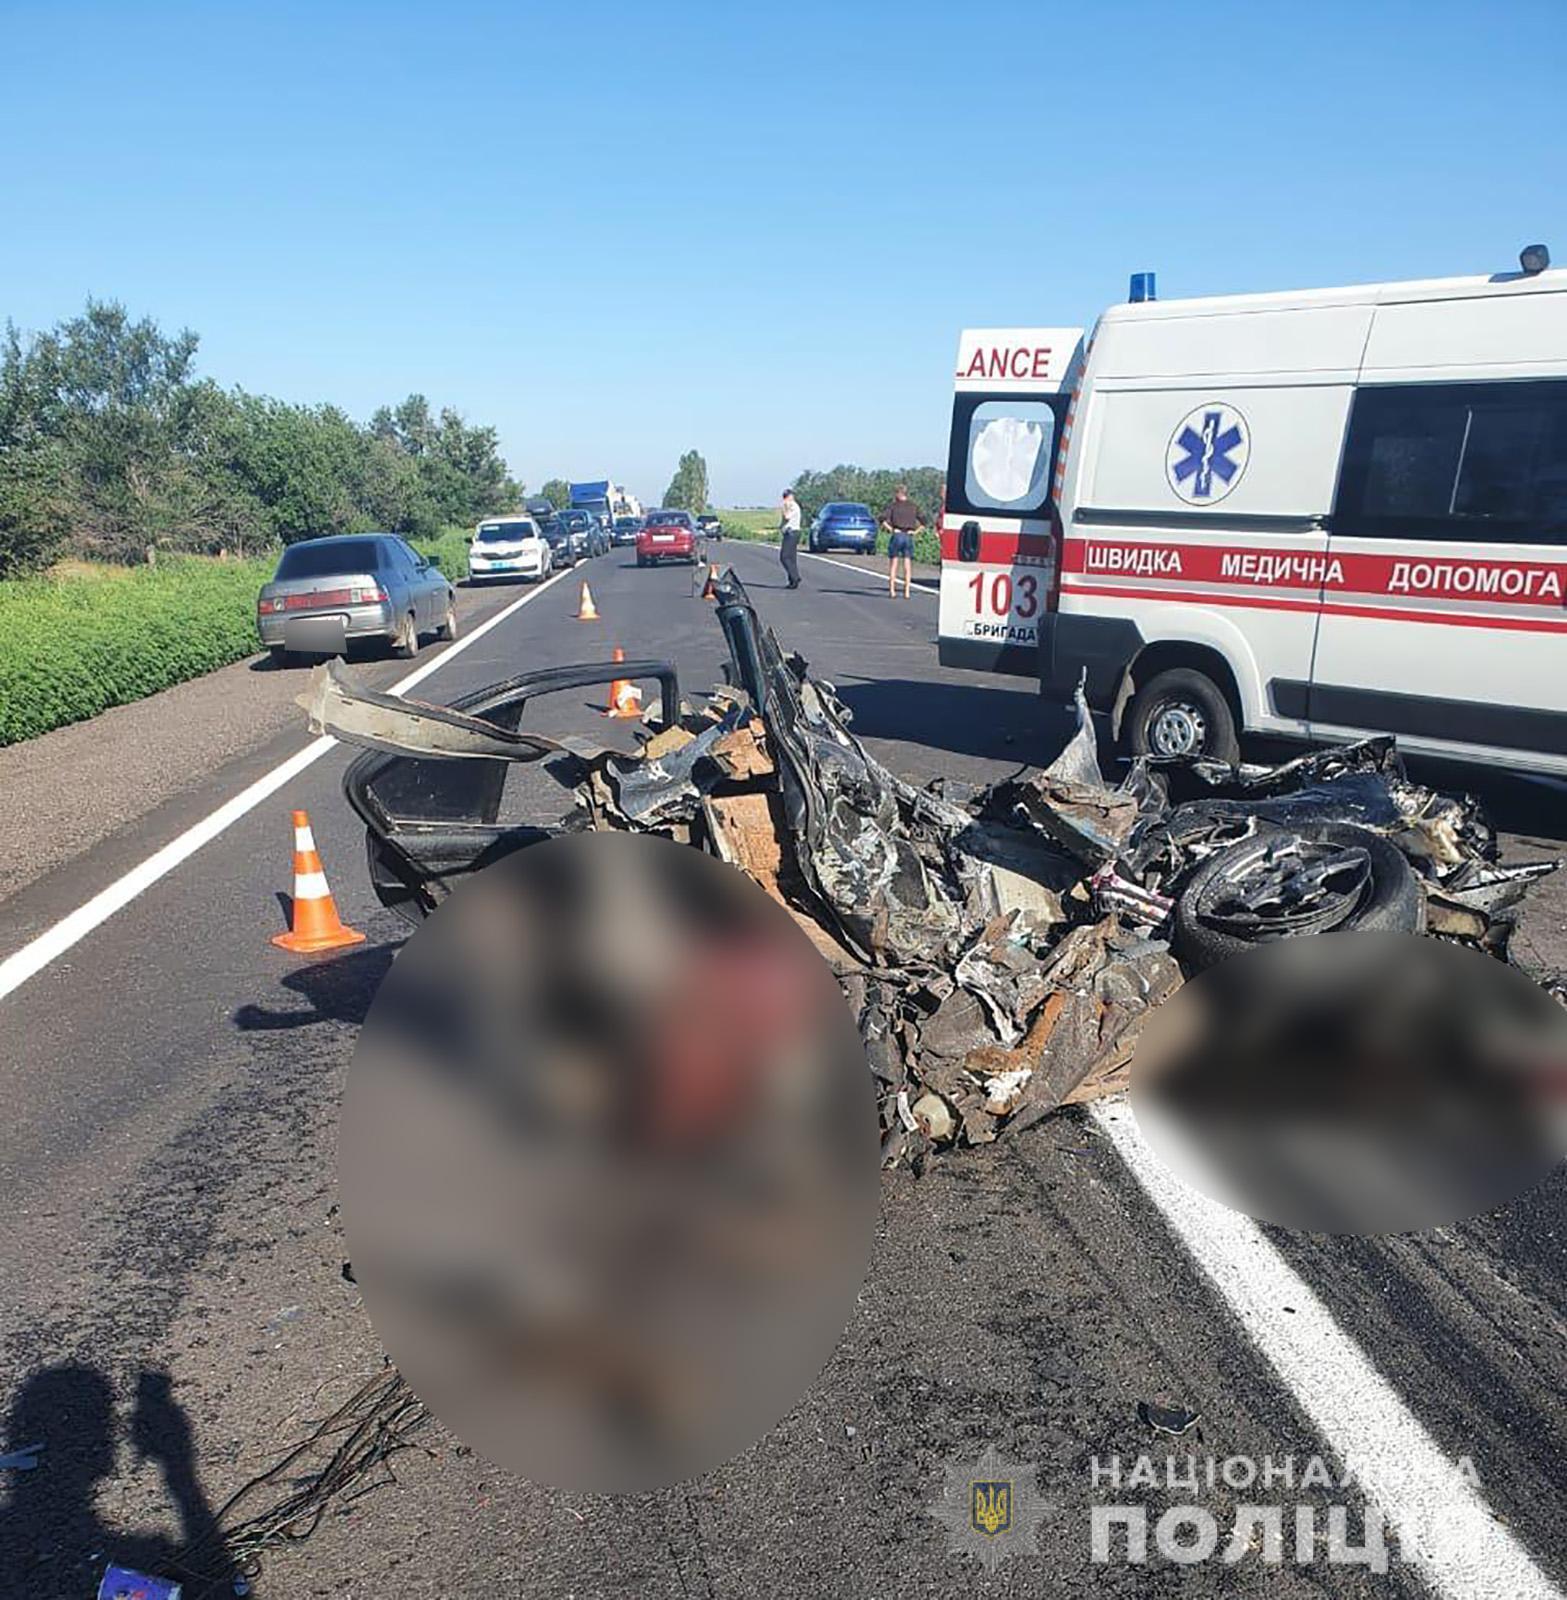 В ДТП на Запорожье погибли 4 человека